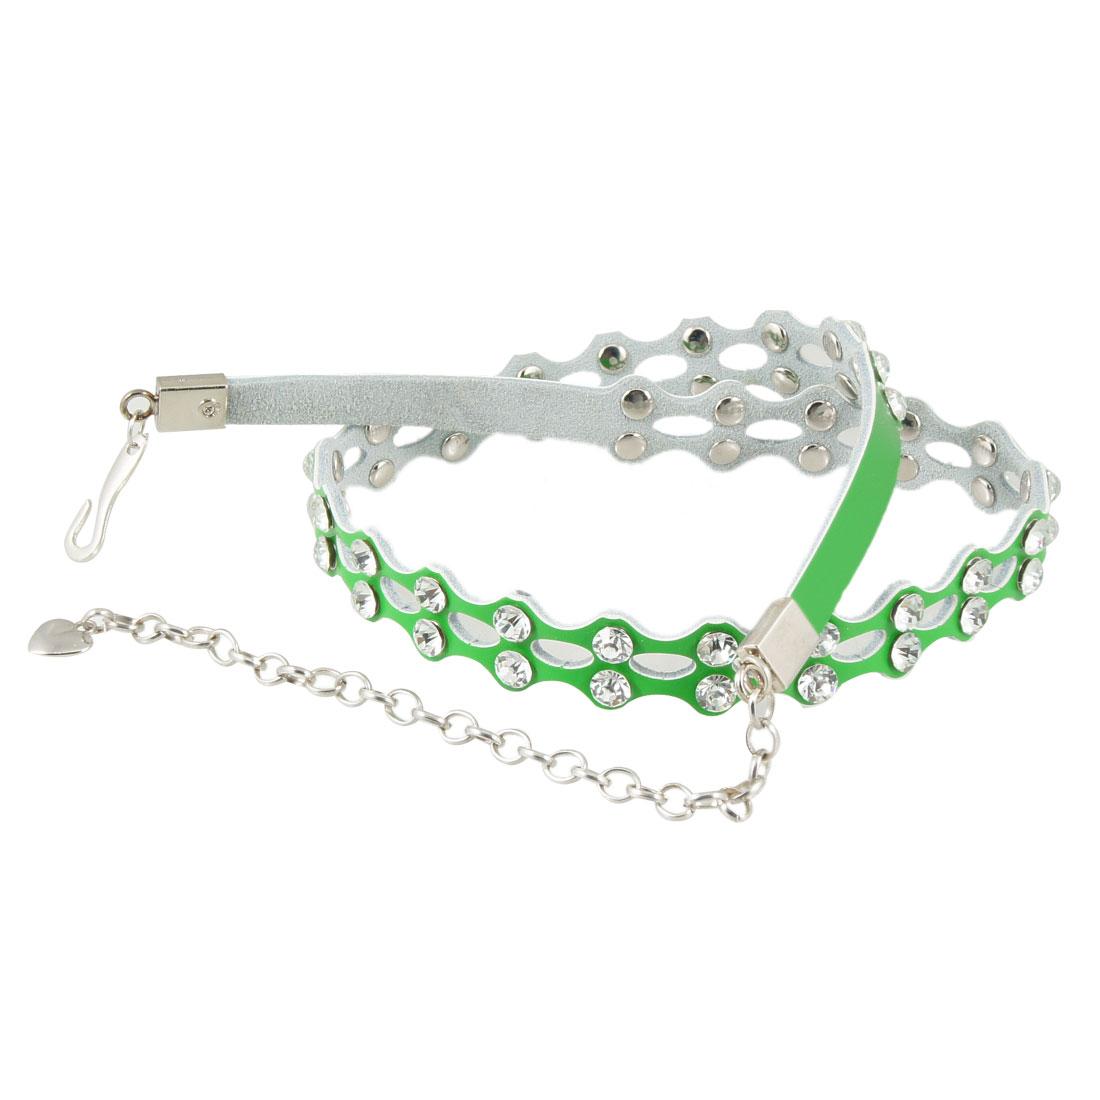 Women Hook Buckle Rhinestones Detailing Skinny Faux Leather Green Waist Chain